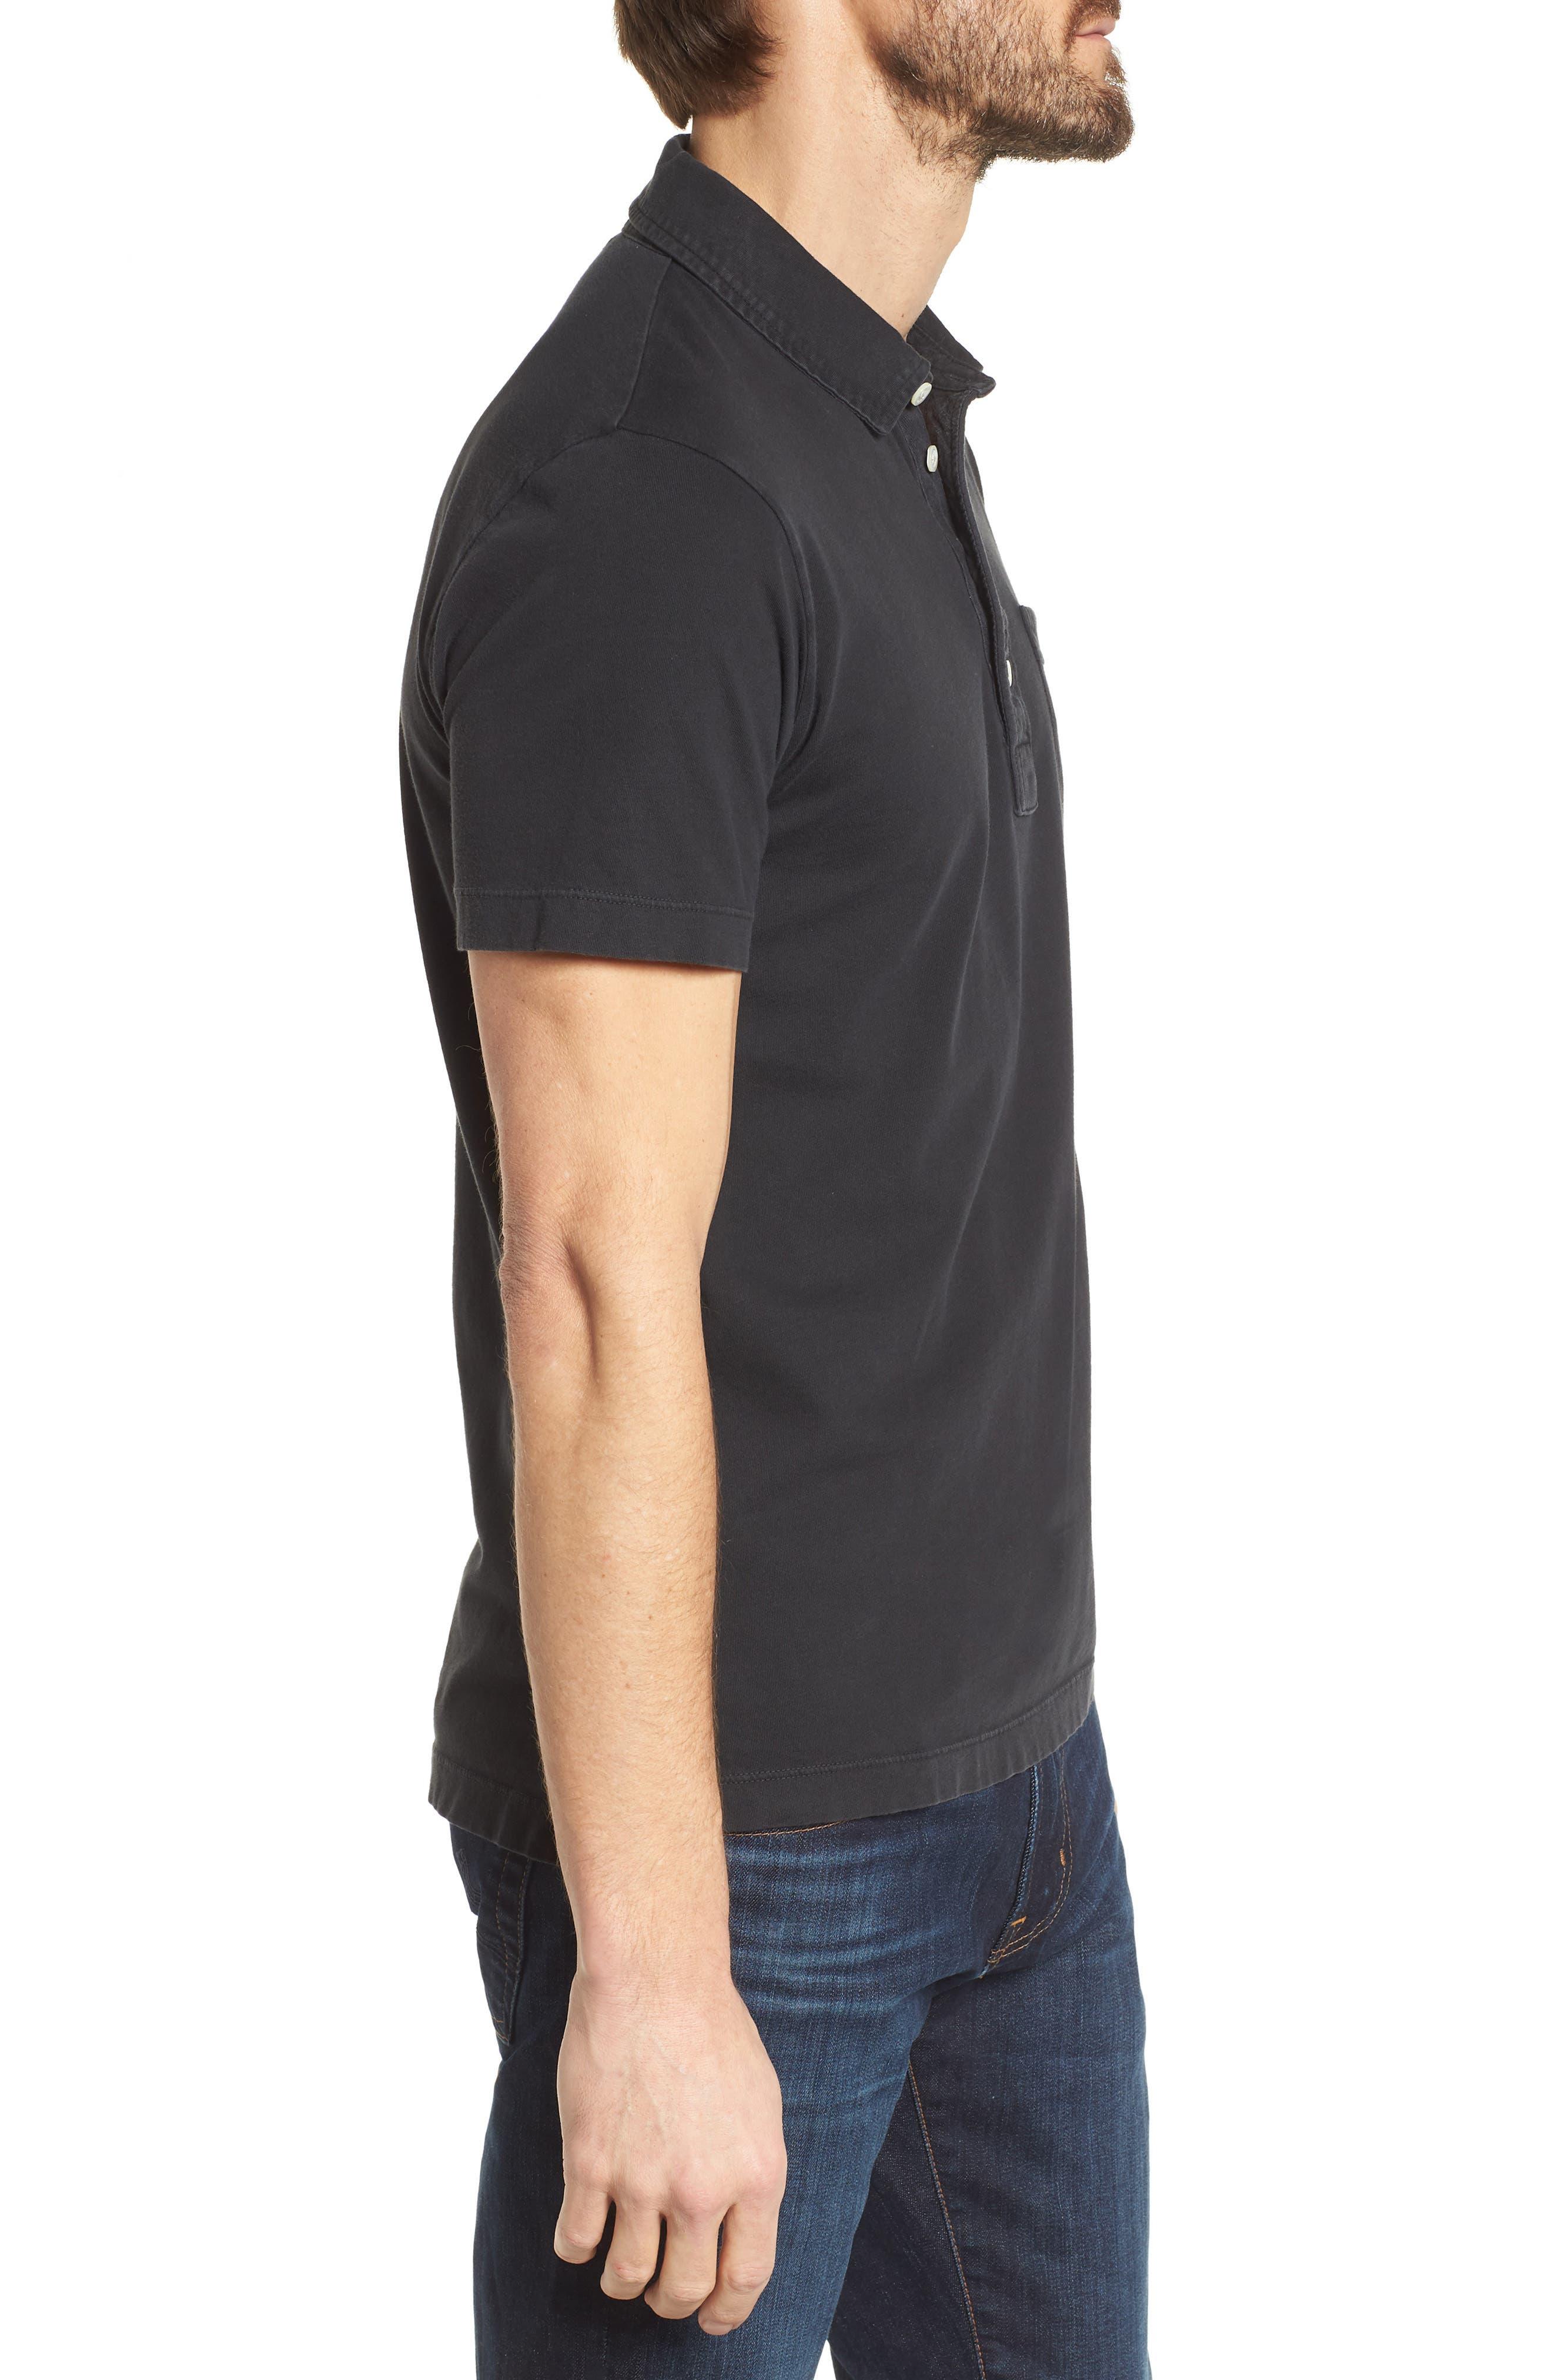 Pensacola GD Slim Fit Polo,                             Alternate thumbnail 3, color,                             Black